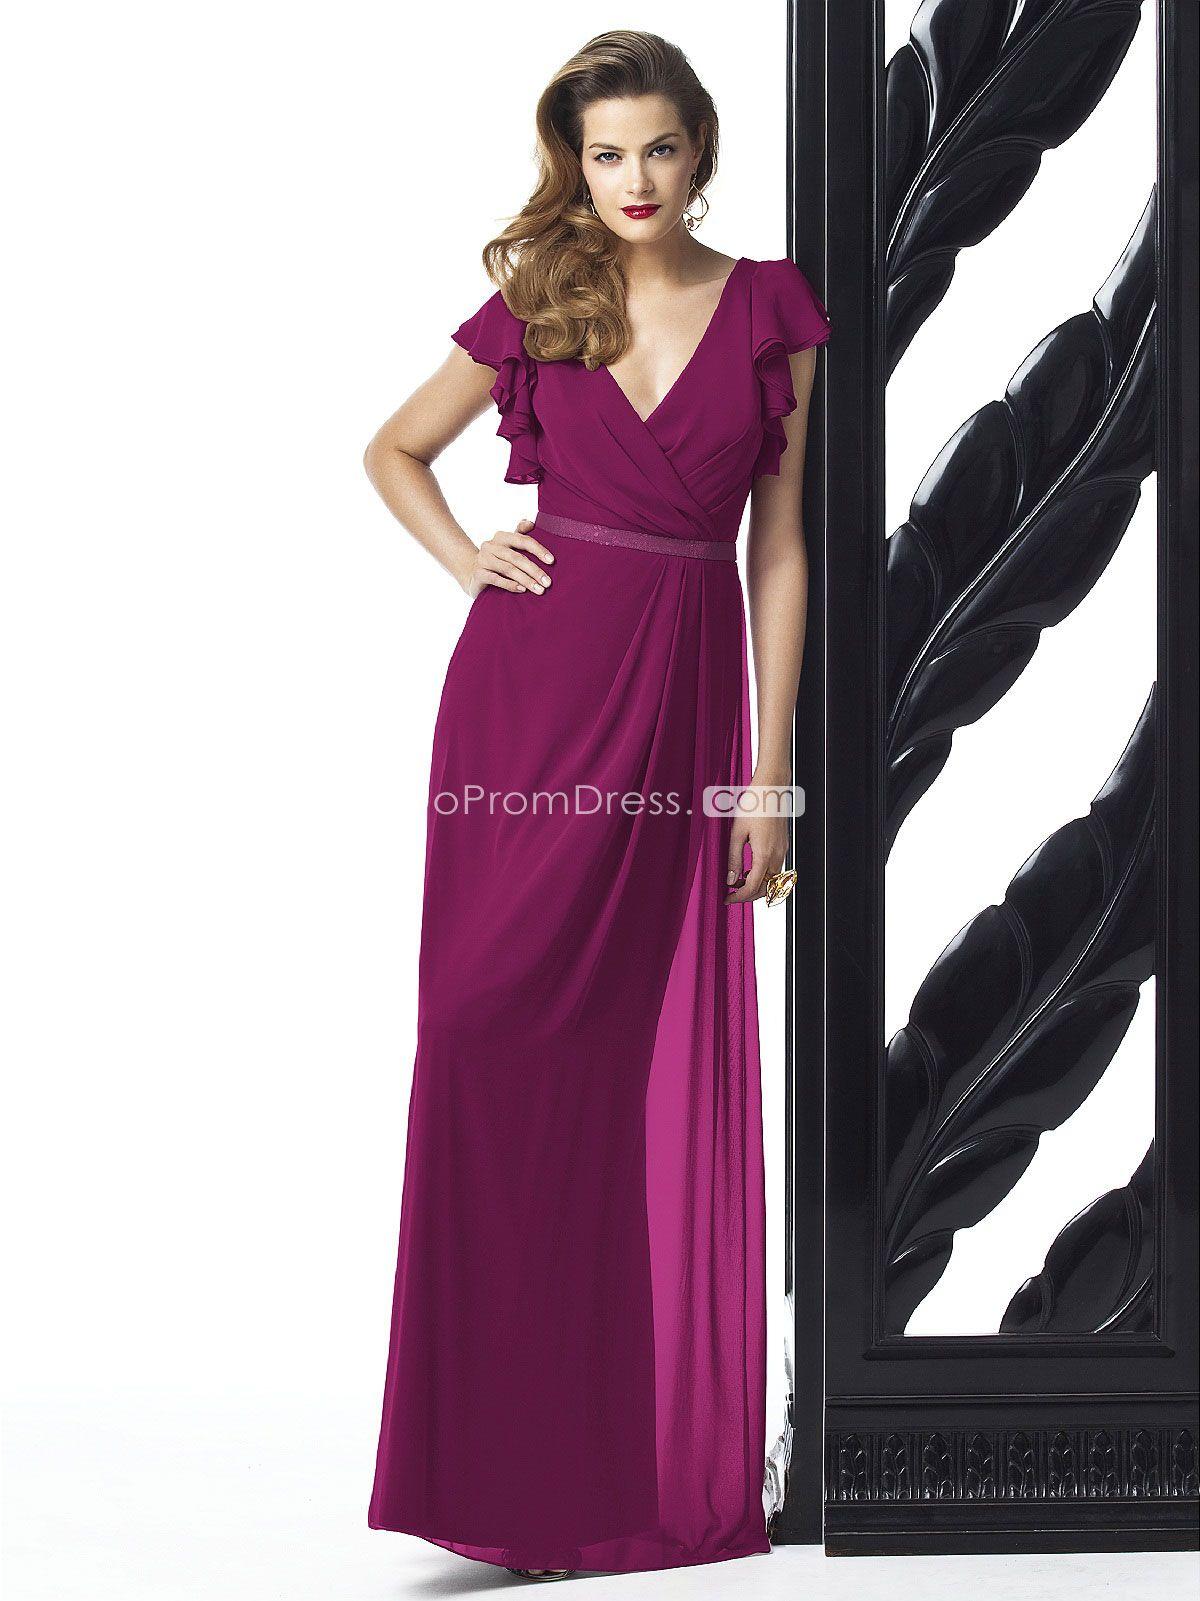 Purple bridesmaid dress bridesmaid dresses pinterest bridal